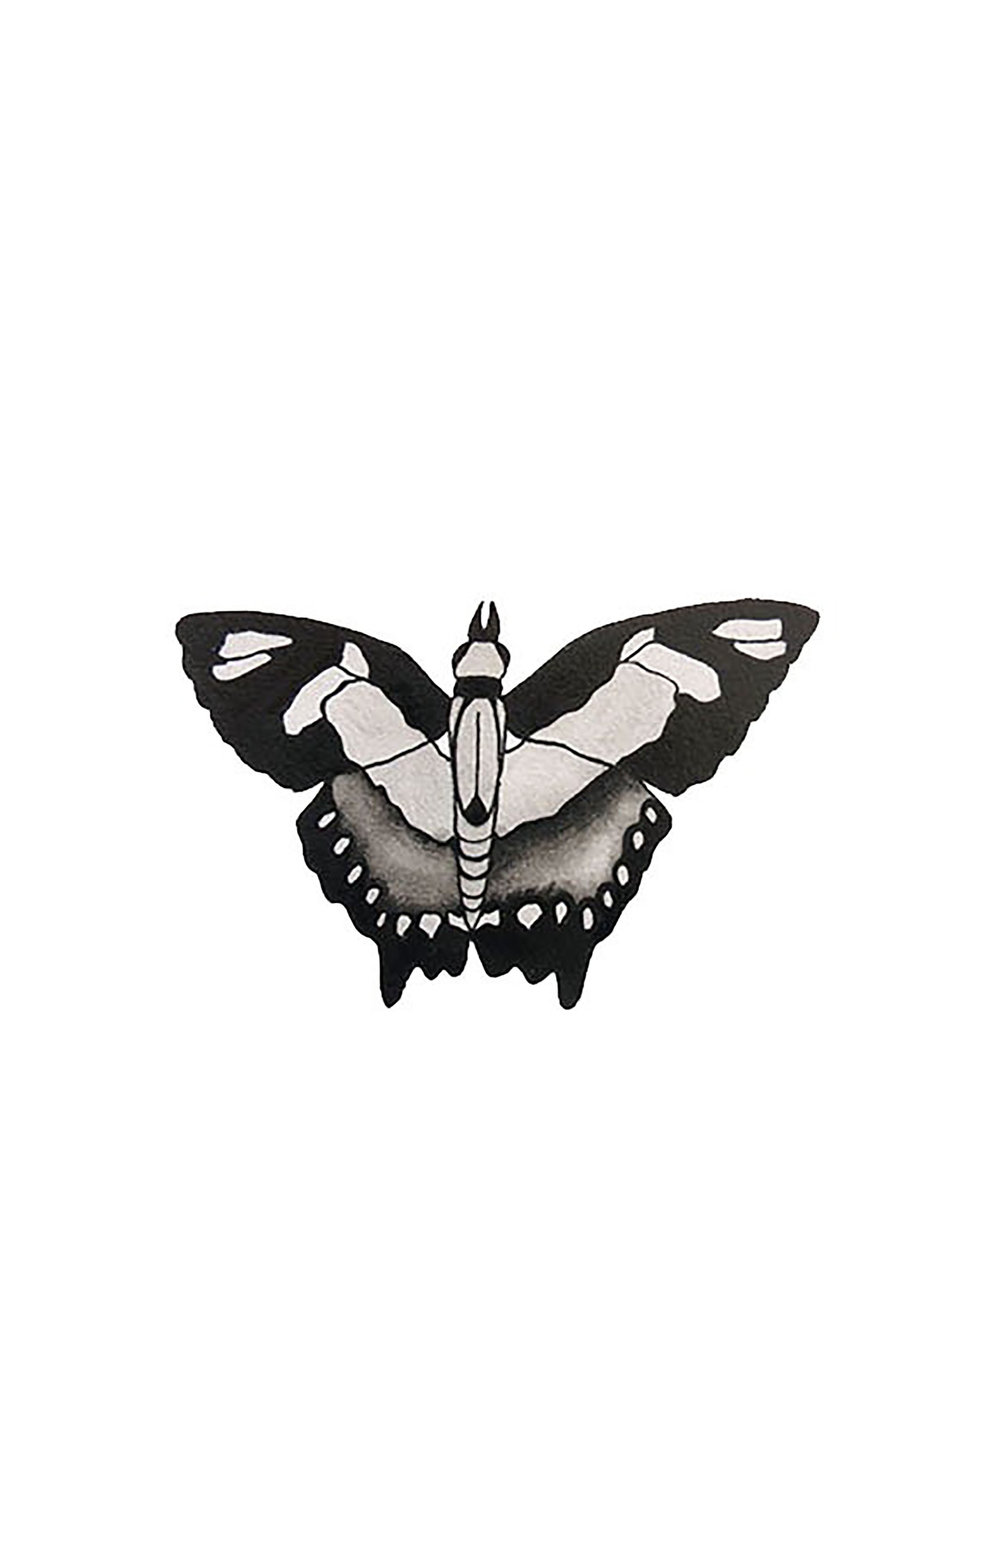 butterfly print 11x17.jpg